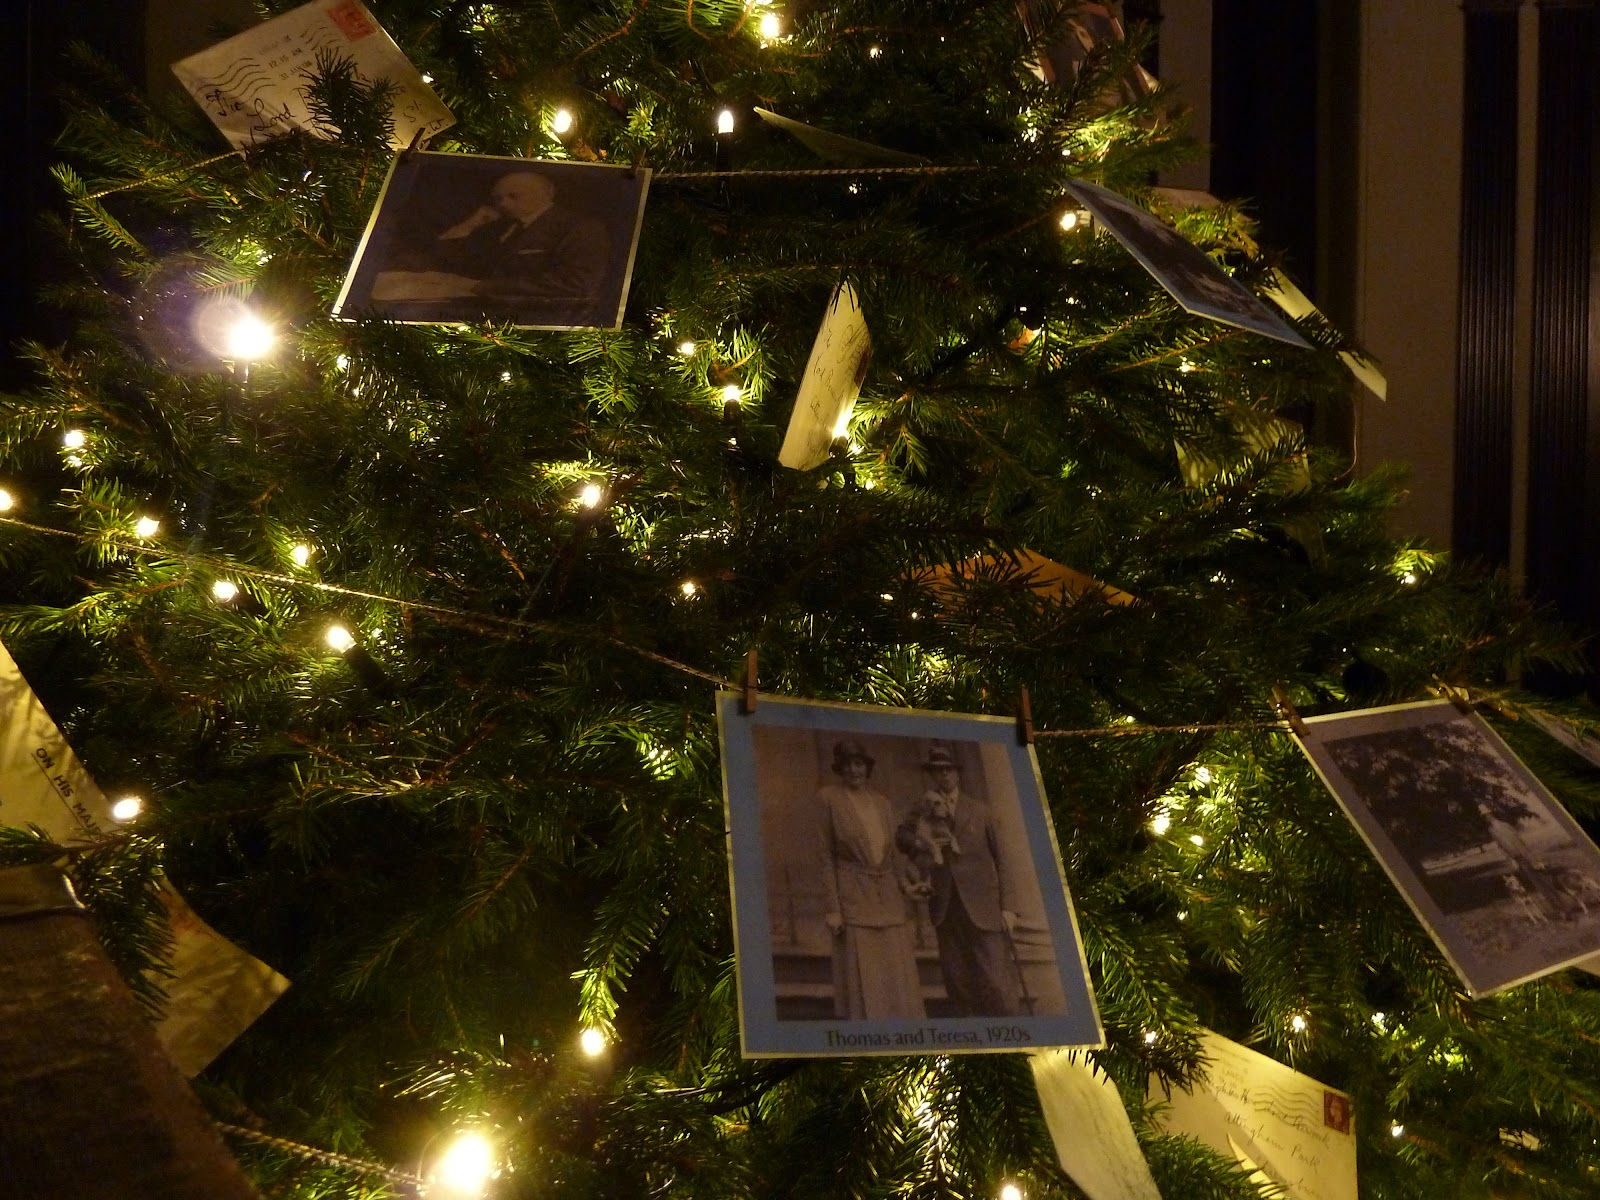 National Trust Properties Open Over Christmas